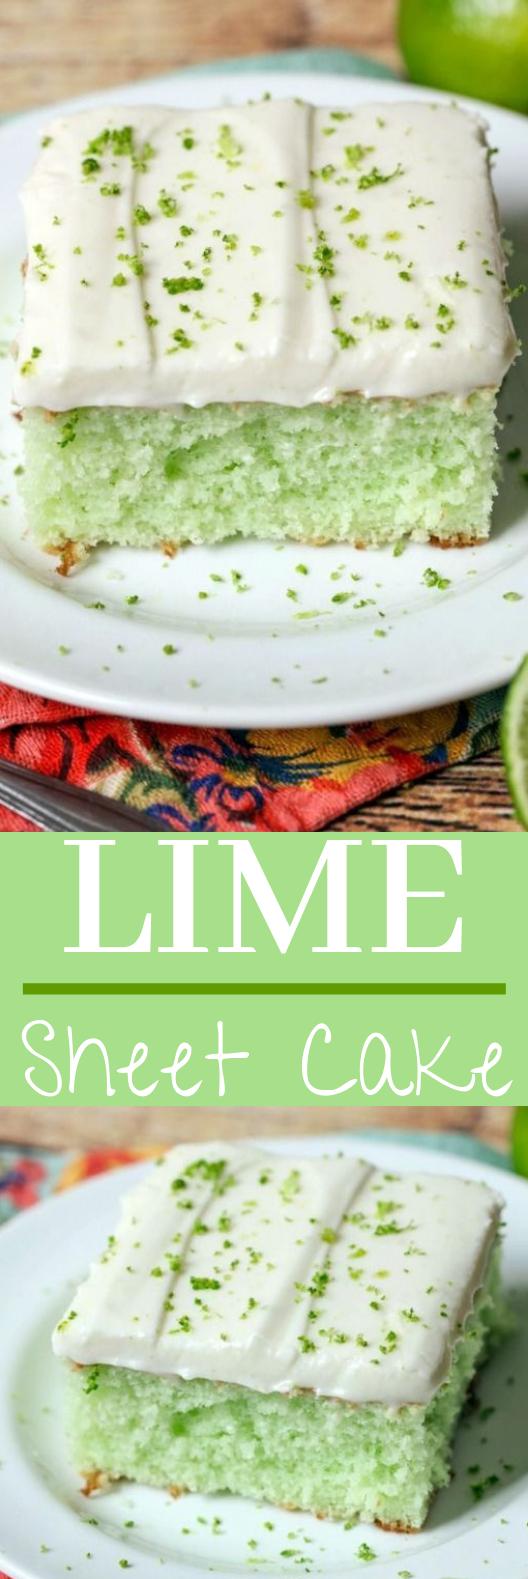 Lime Sheet Cake #desserts #cake